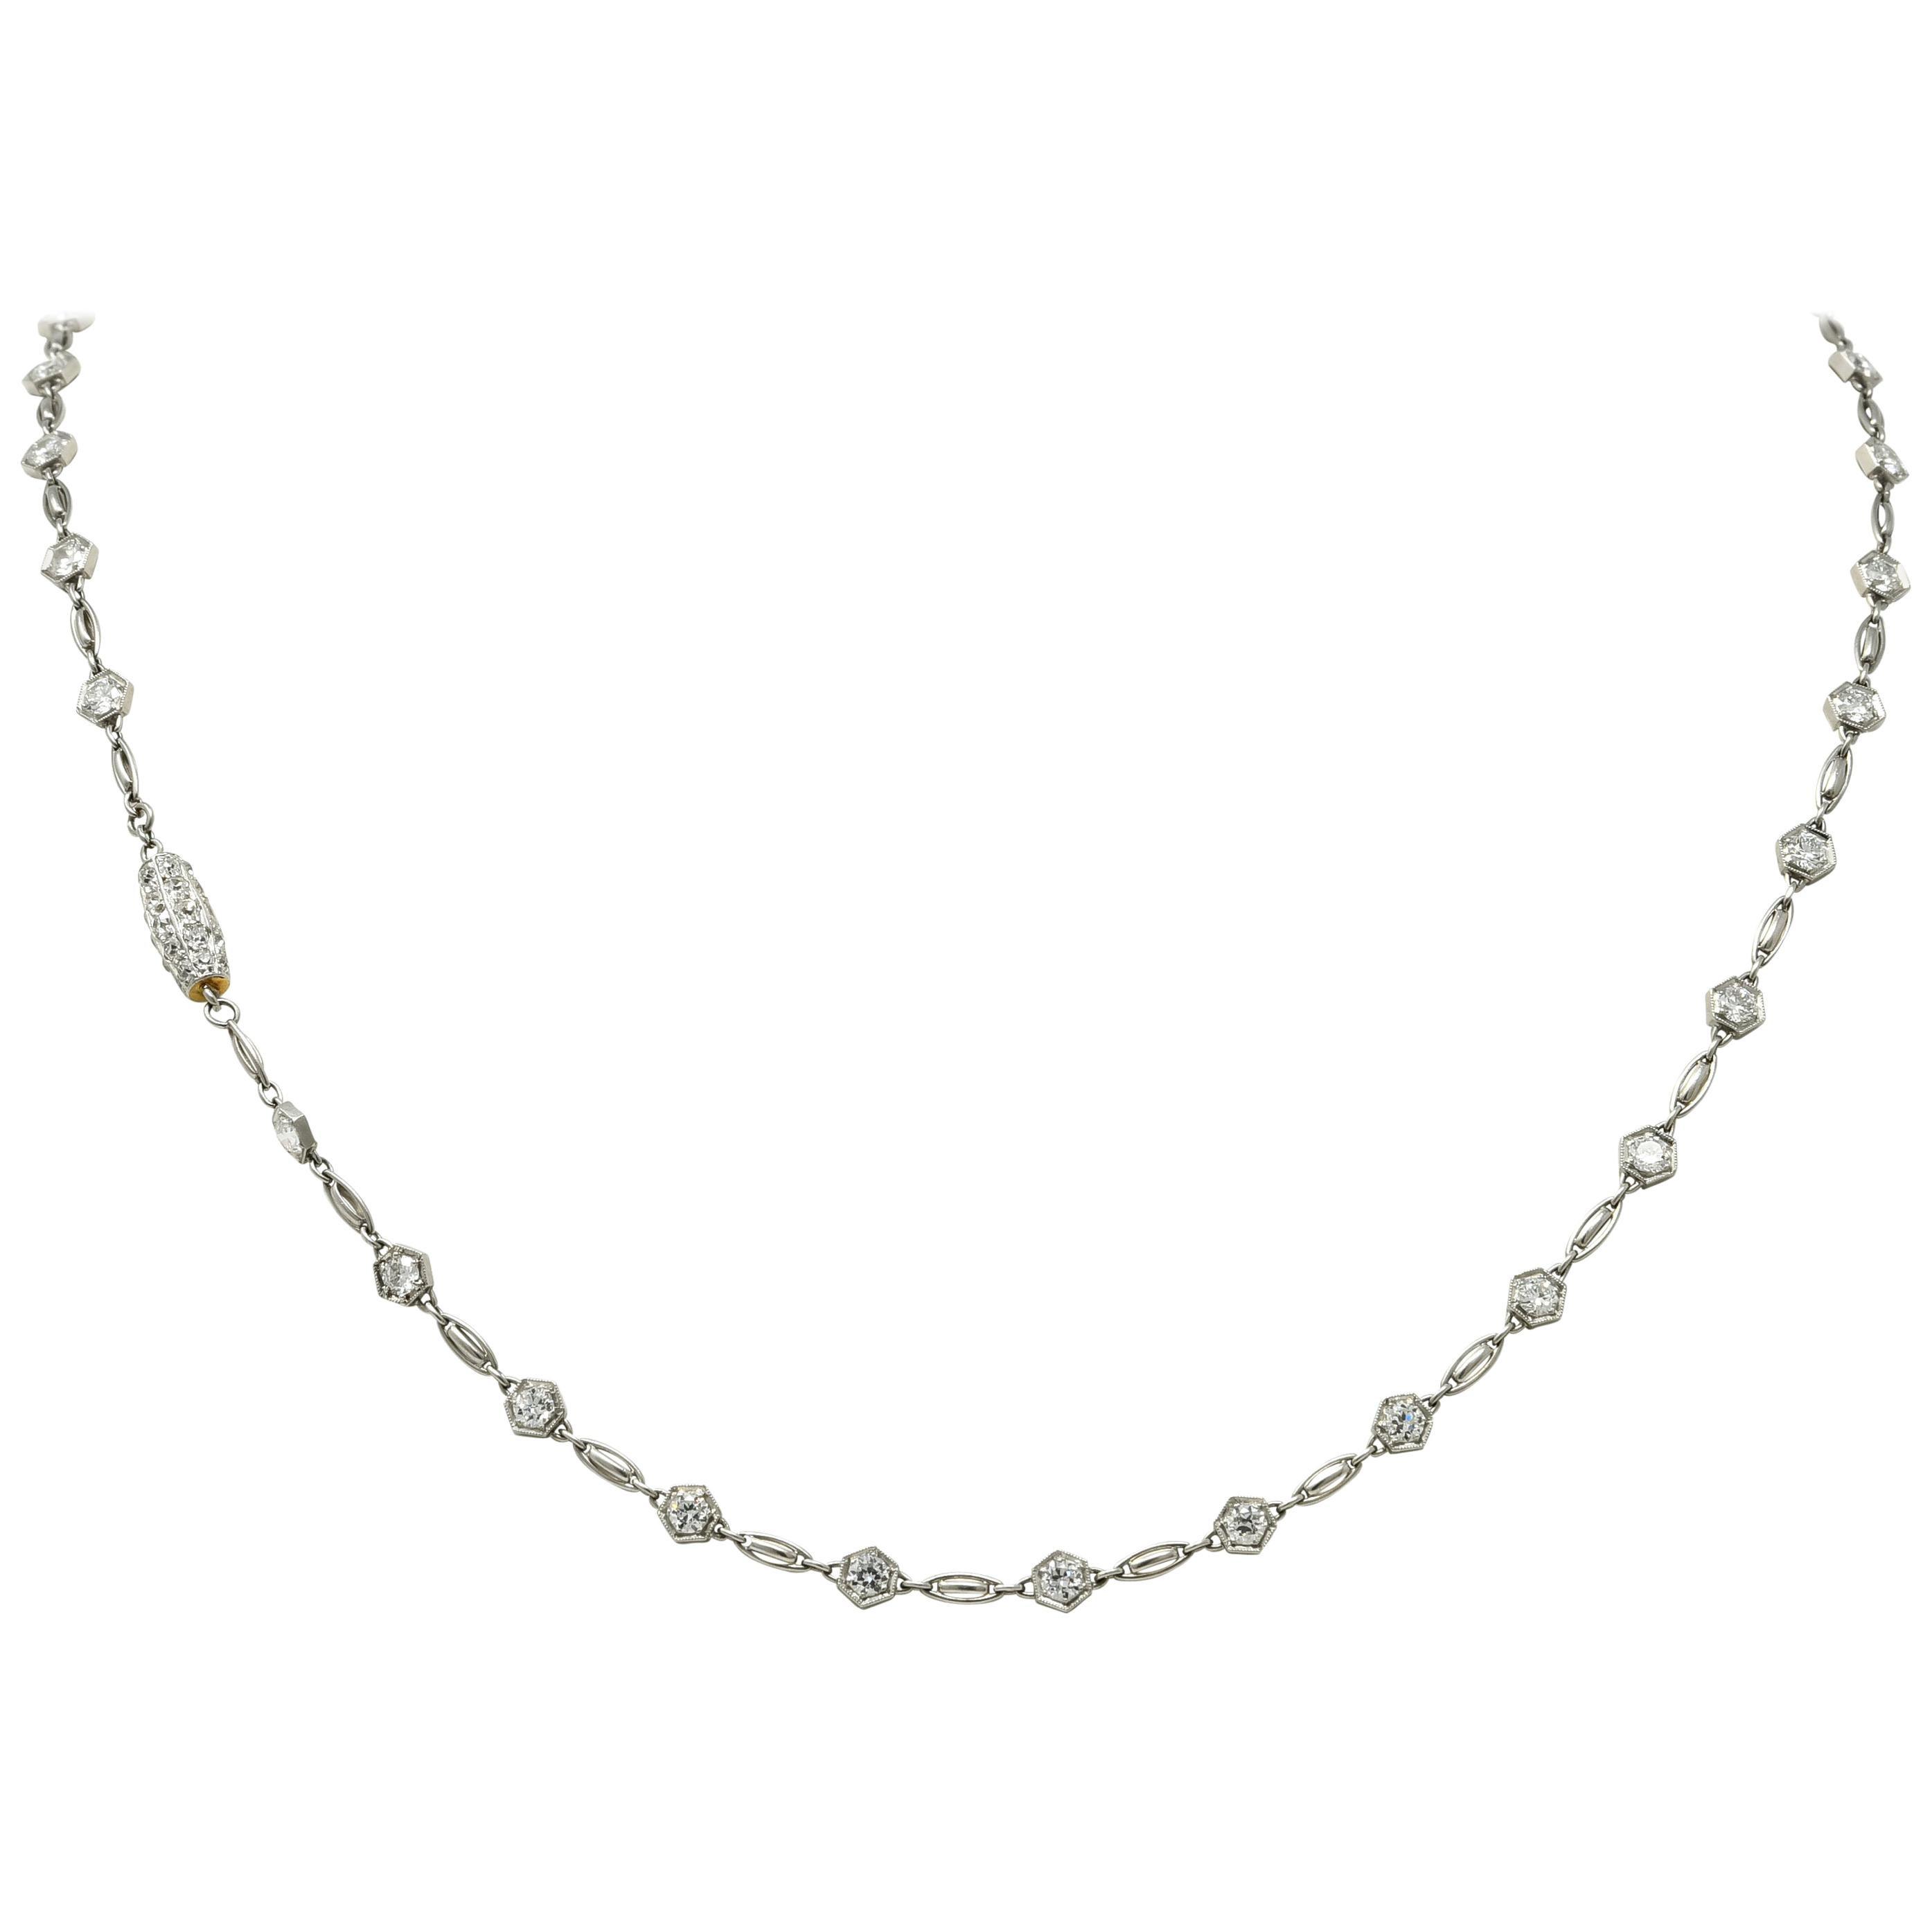 Stunning Art Deco 6.54 Carat Diamond Platinum Link Necklace, circa 1925